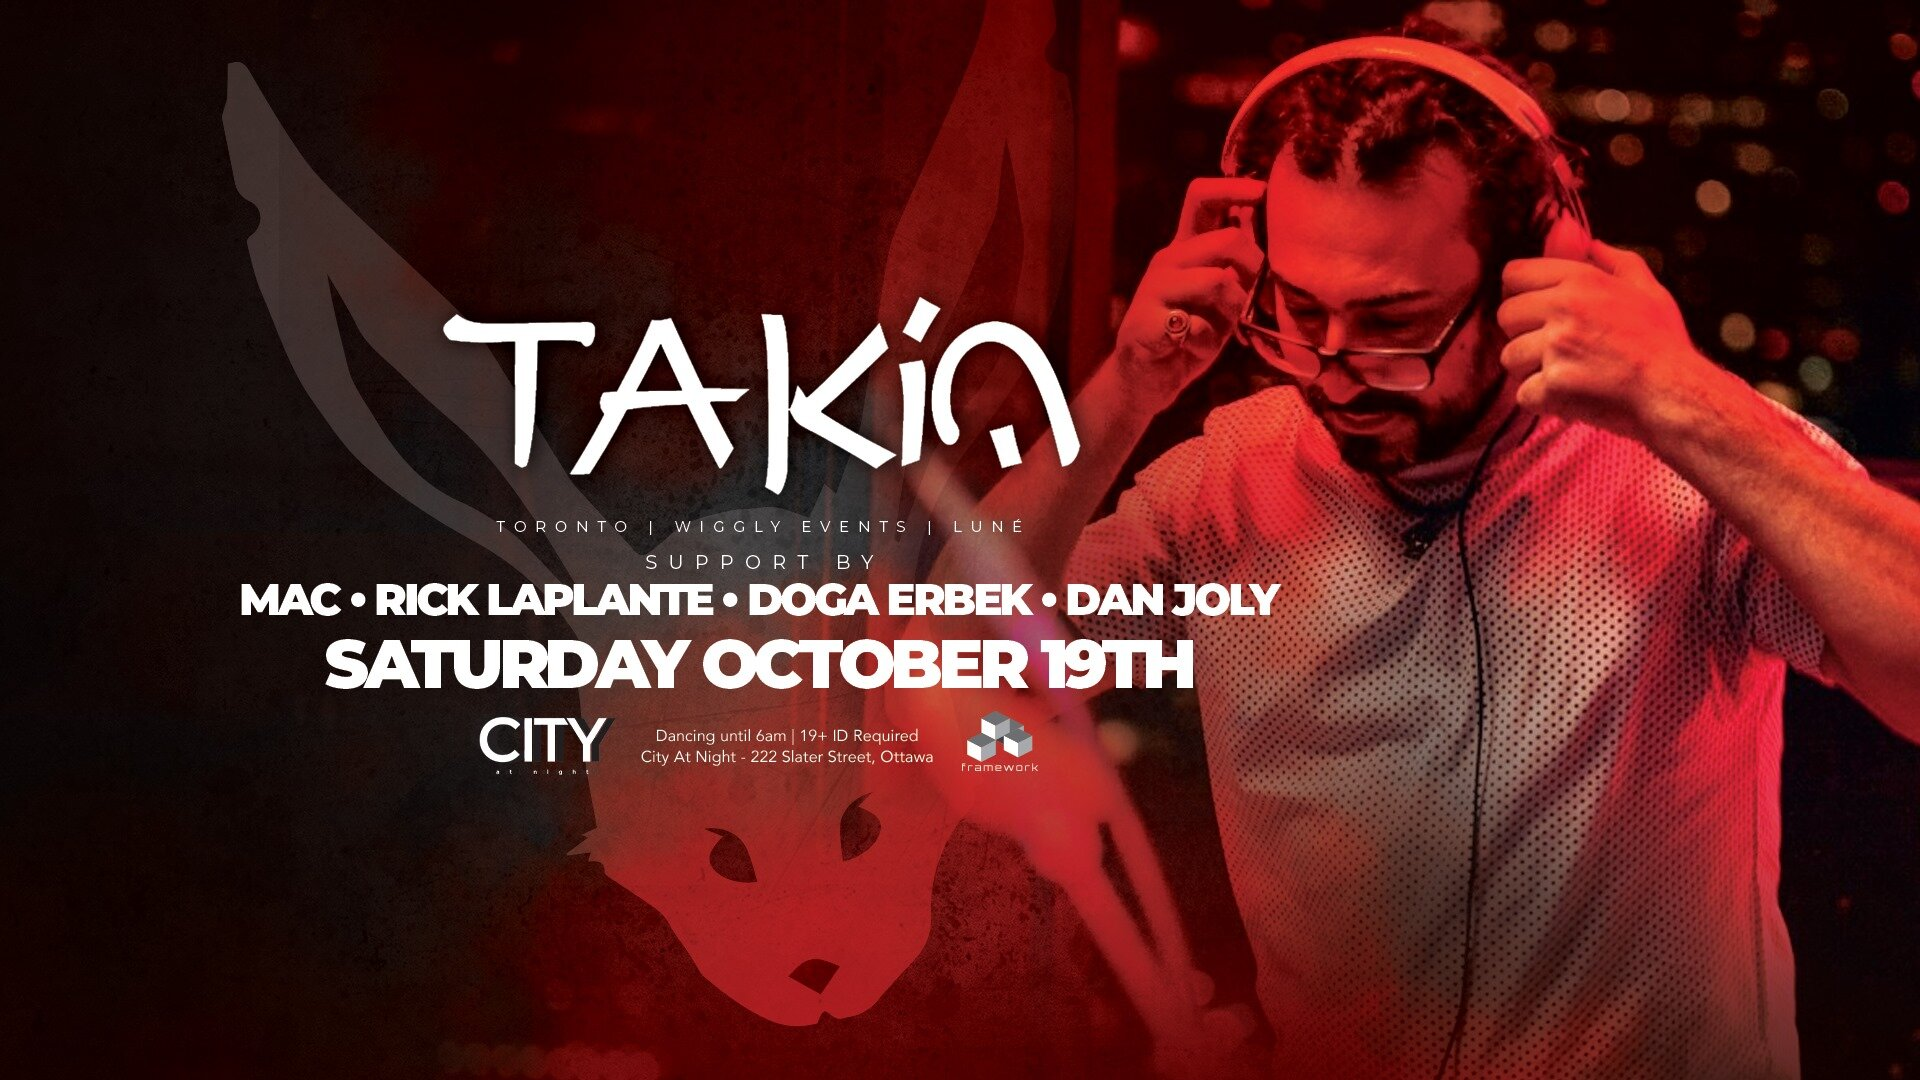 White Rabbit: TAKiN - All Night Dancing 11pm to 6am